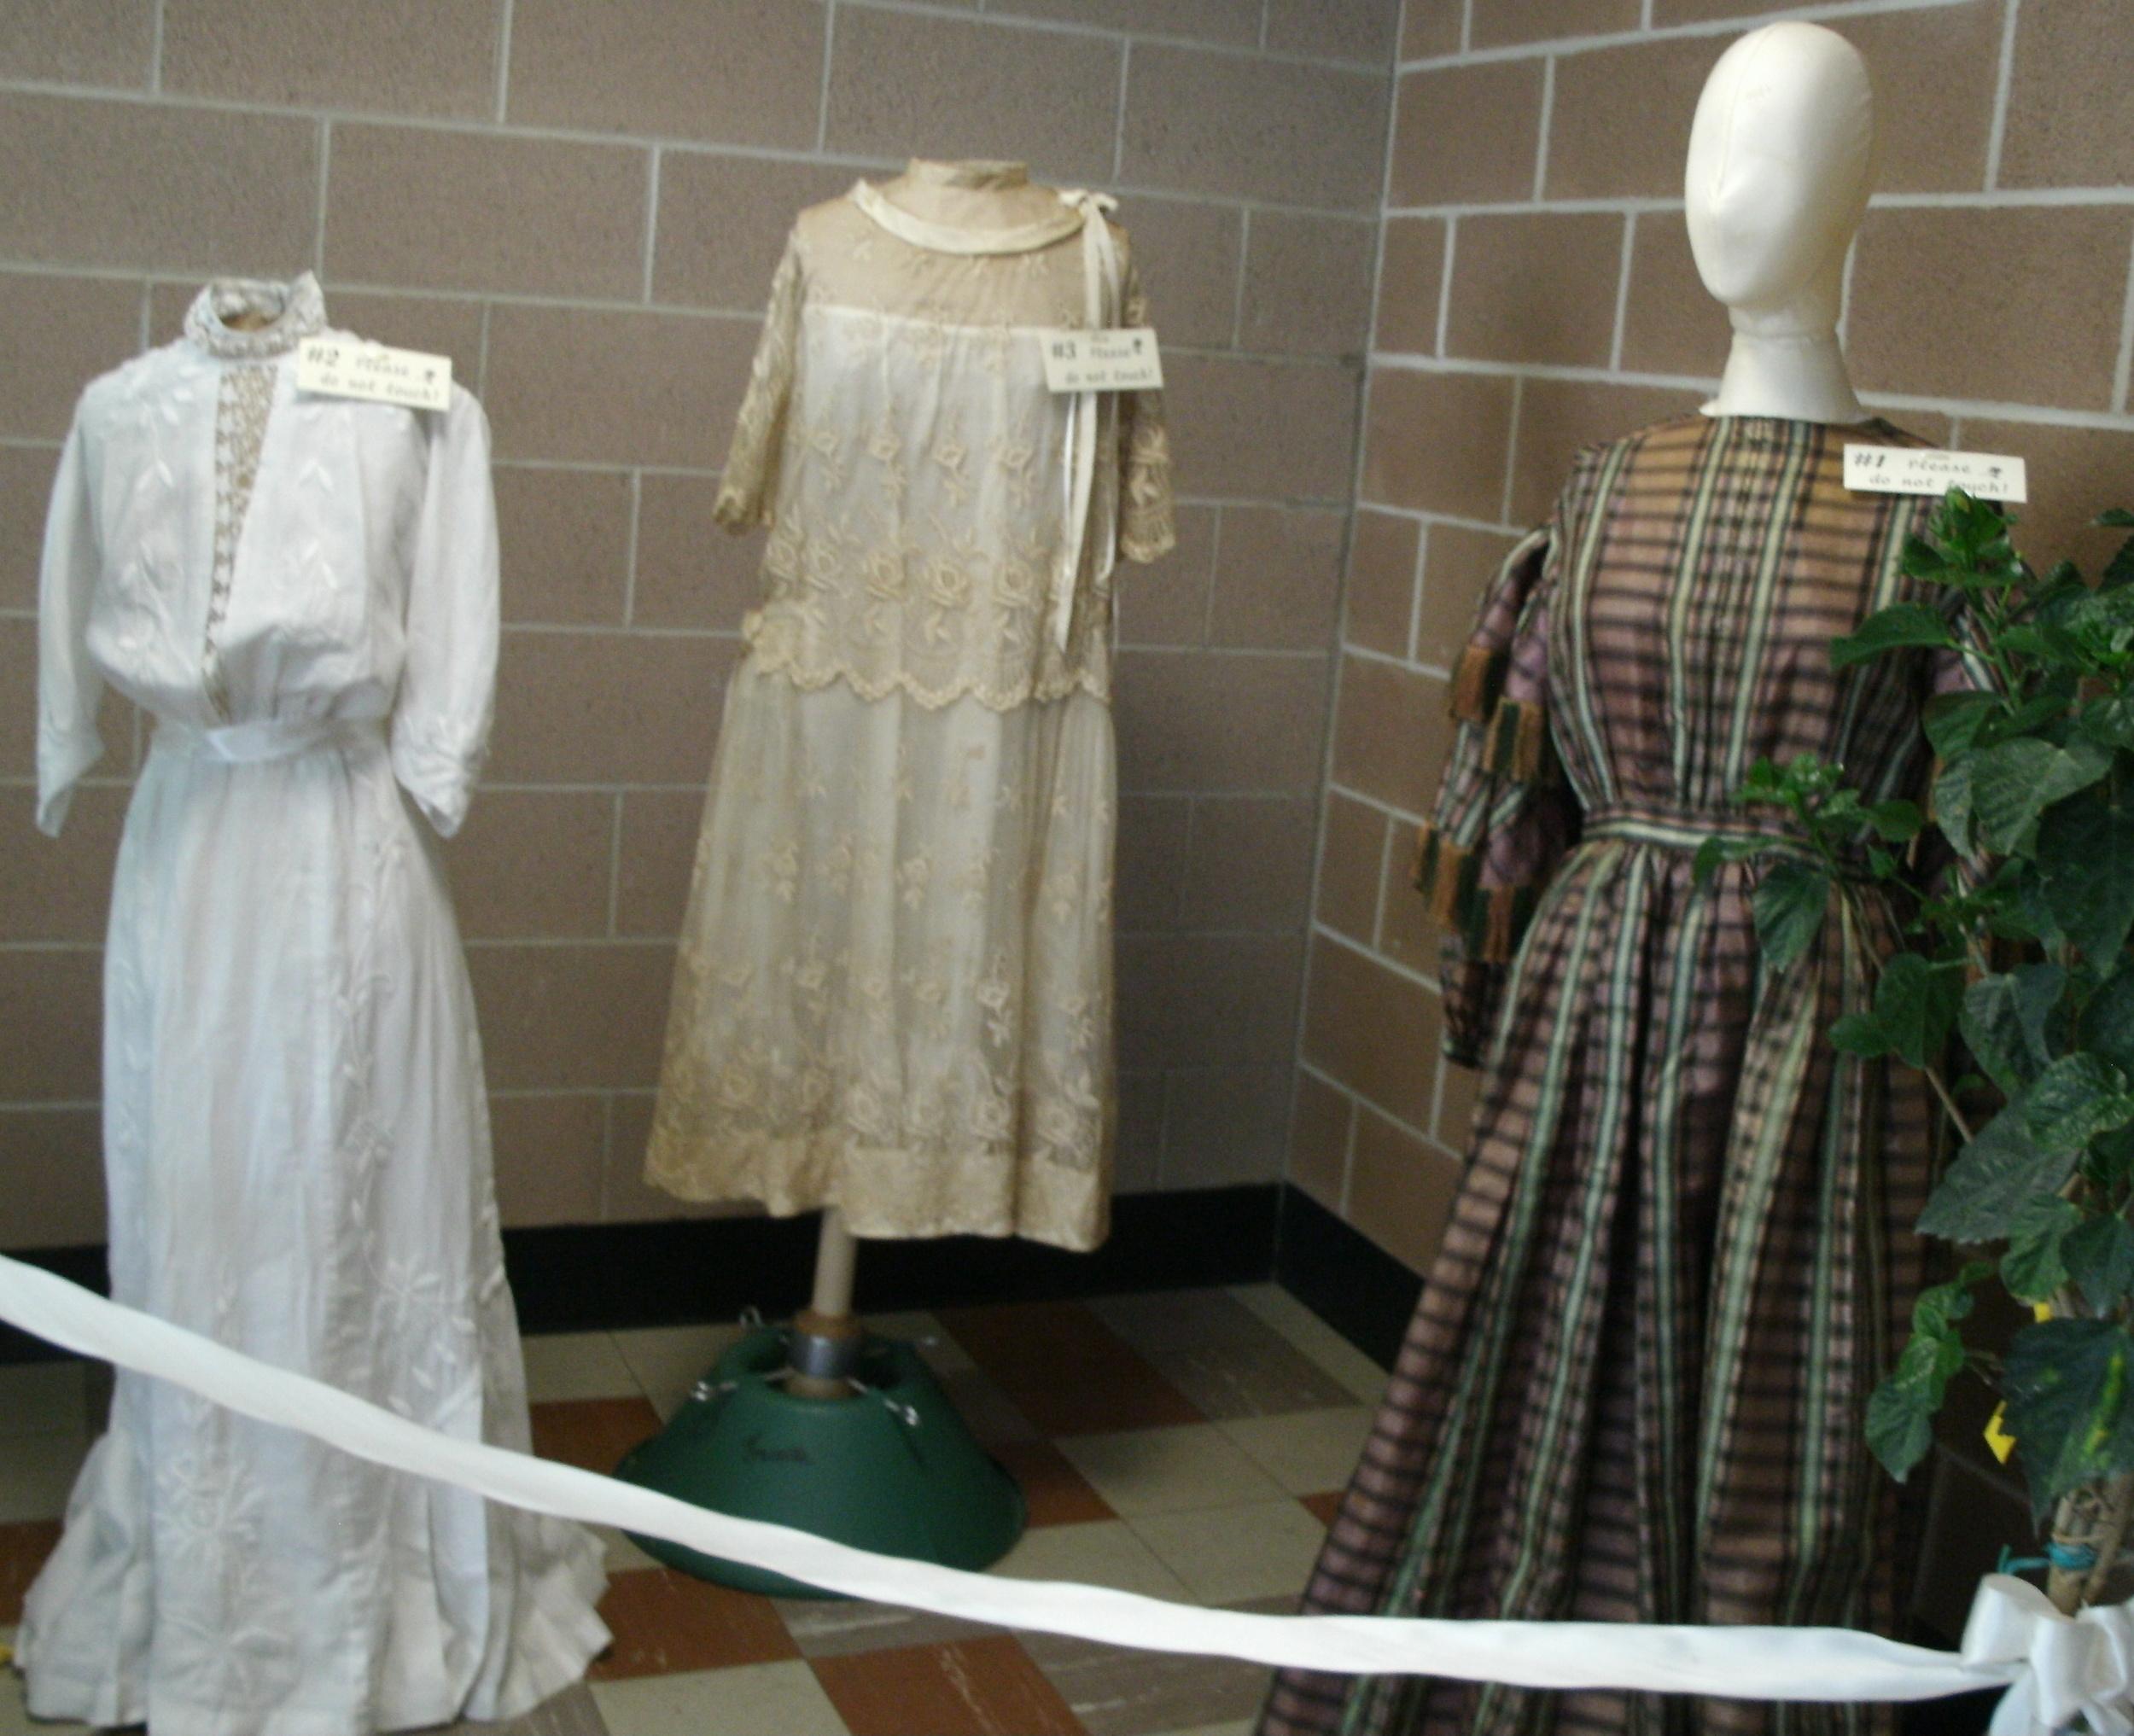 7arrangement and wedding gown4 hist society cr.jpg